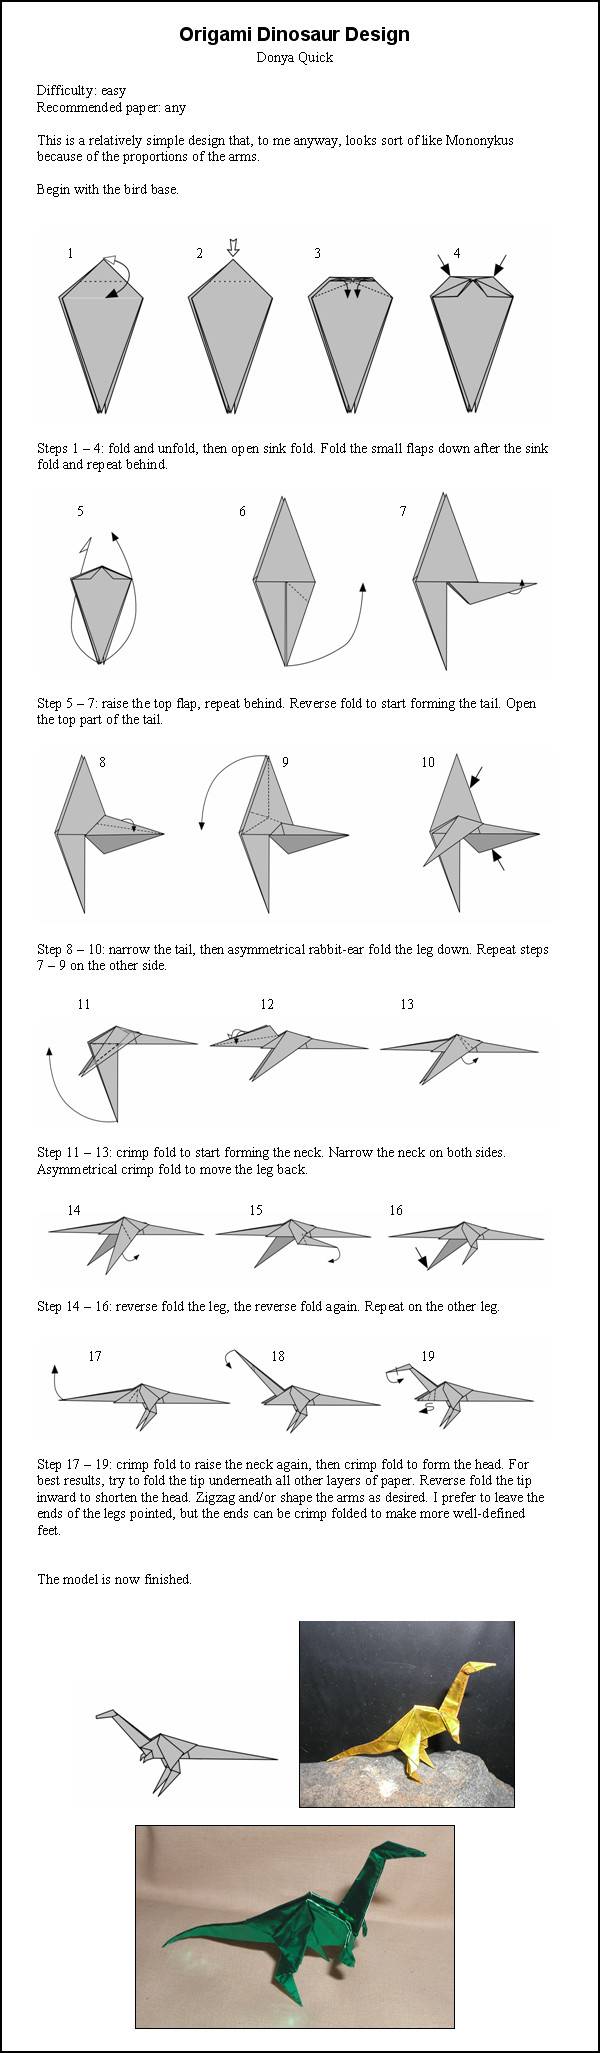 Origami Dinosaur Instructions by DonyaQuick on DeviantArt - photo#5